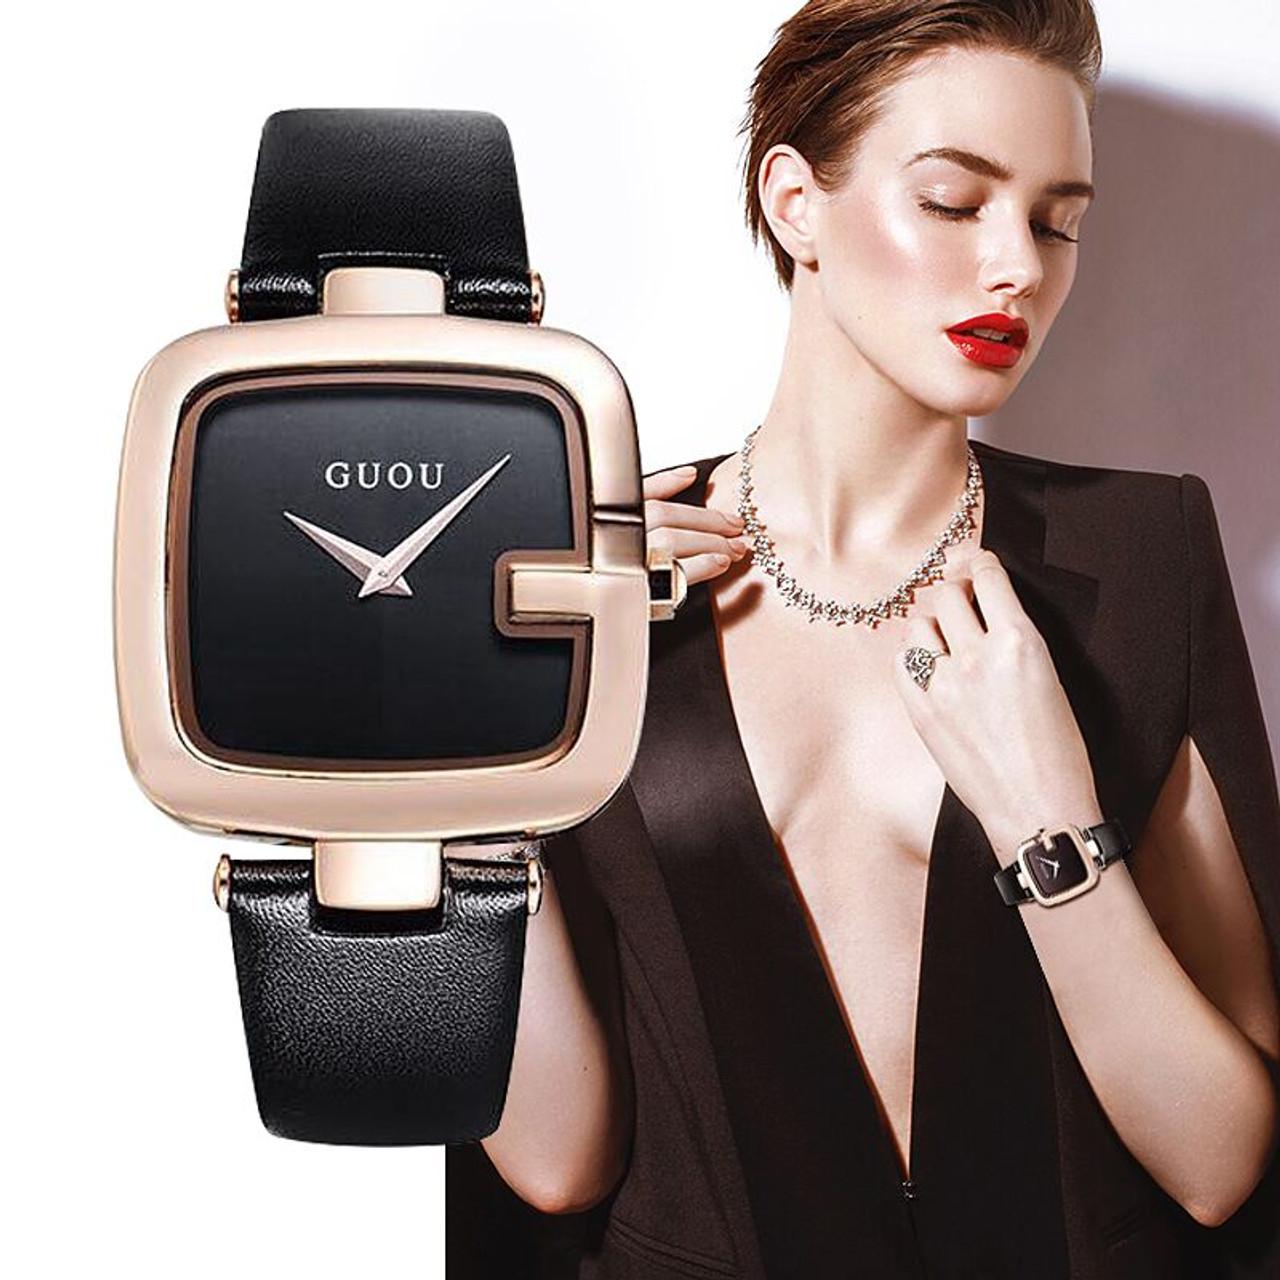 44592cb65 ... Women's Watches GUOU Montre Femme Fashion Ladies Bracelet Watches For  ...